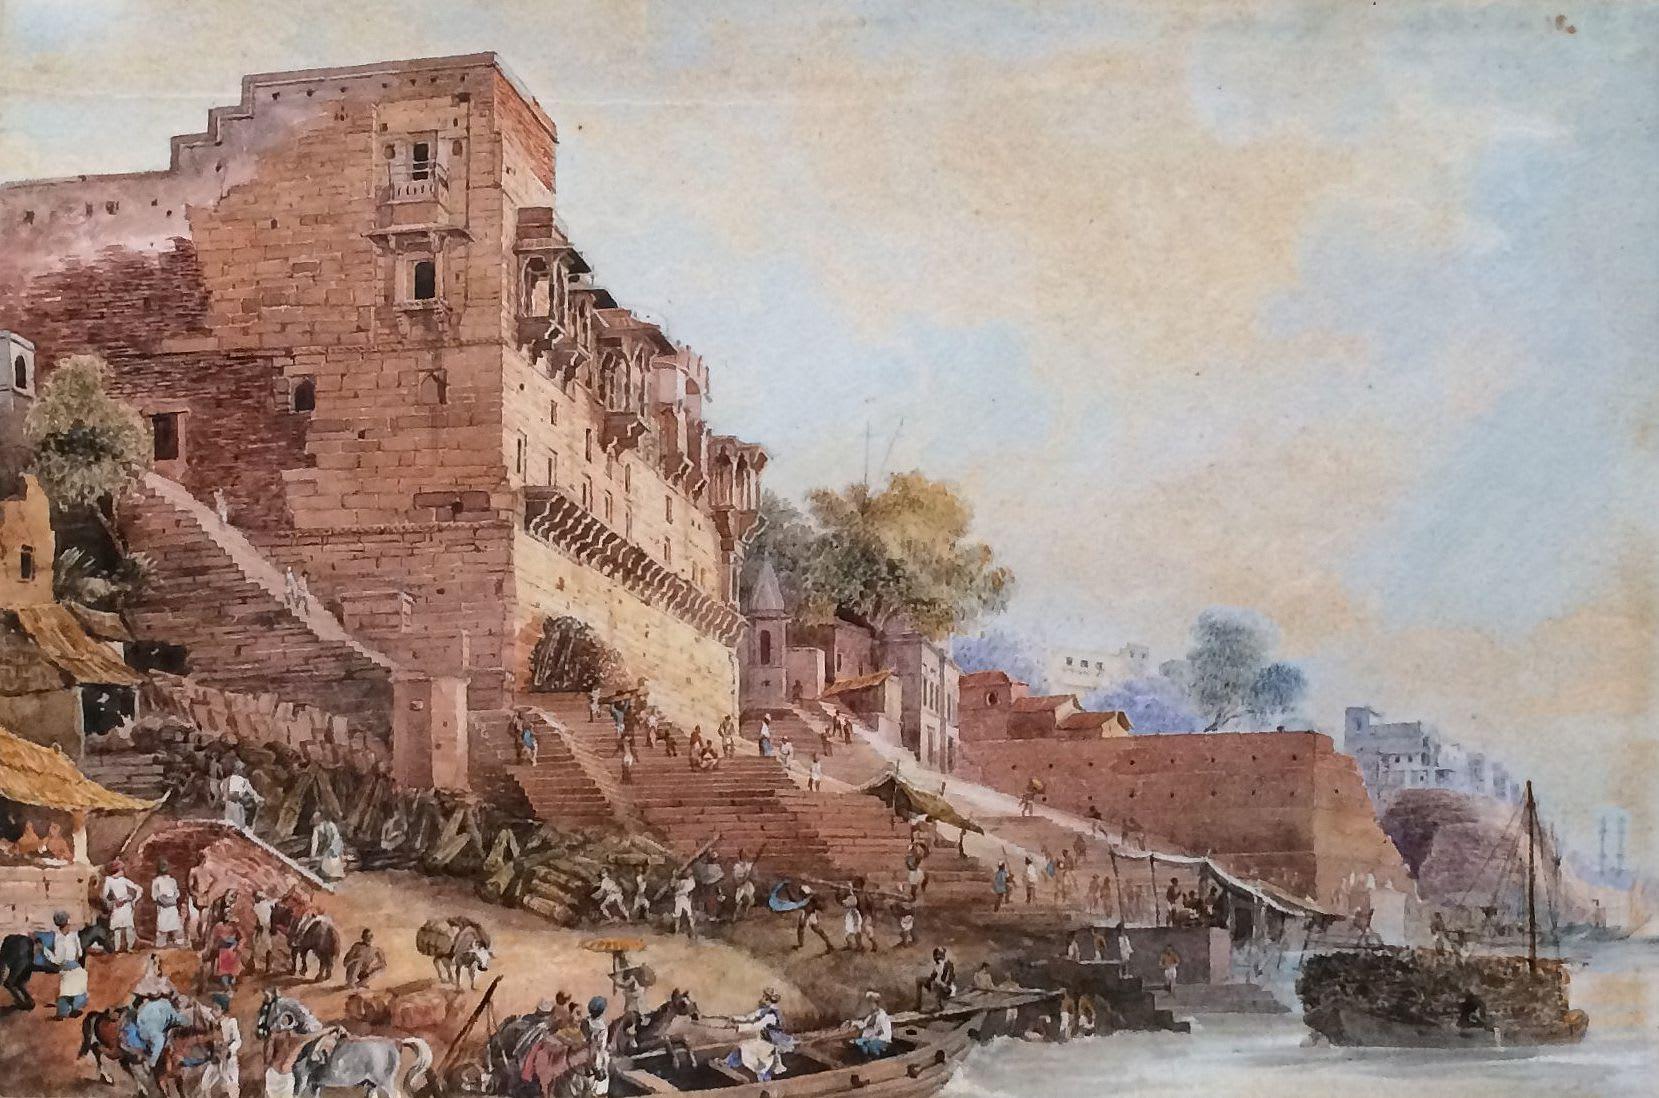 Варанаси, Индия, 1829 год. Художник James Prinsep